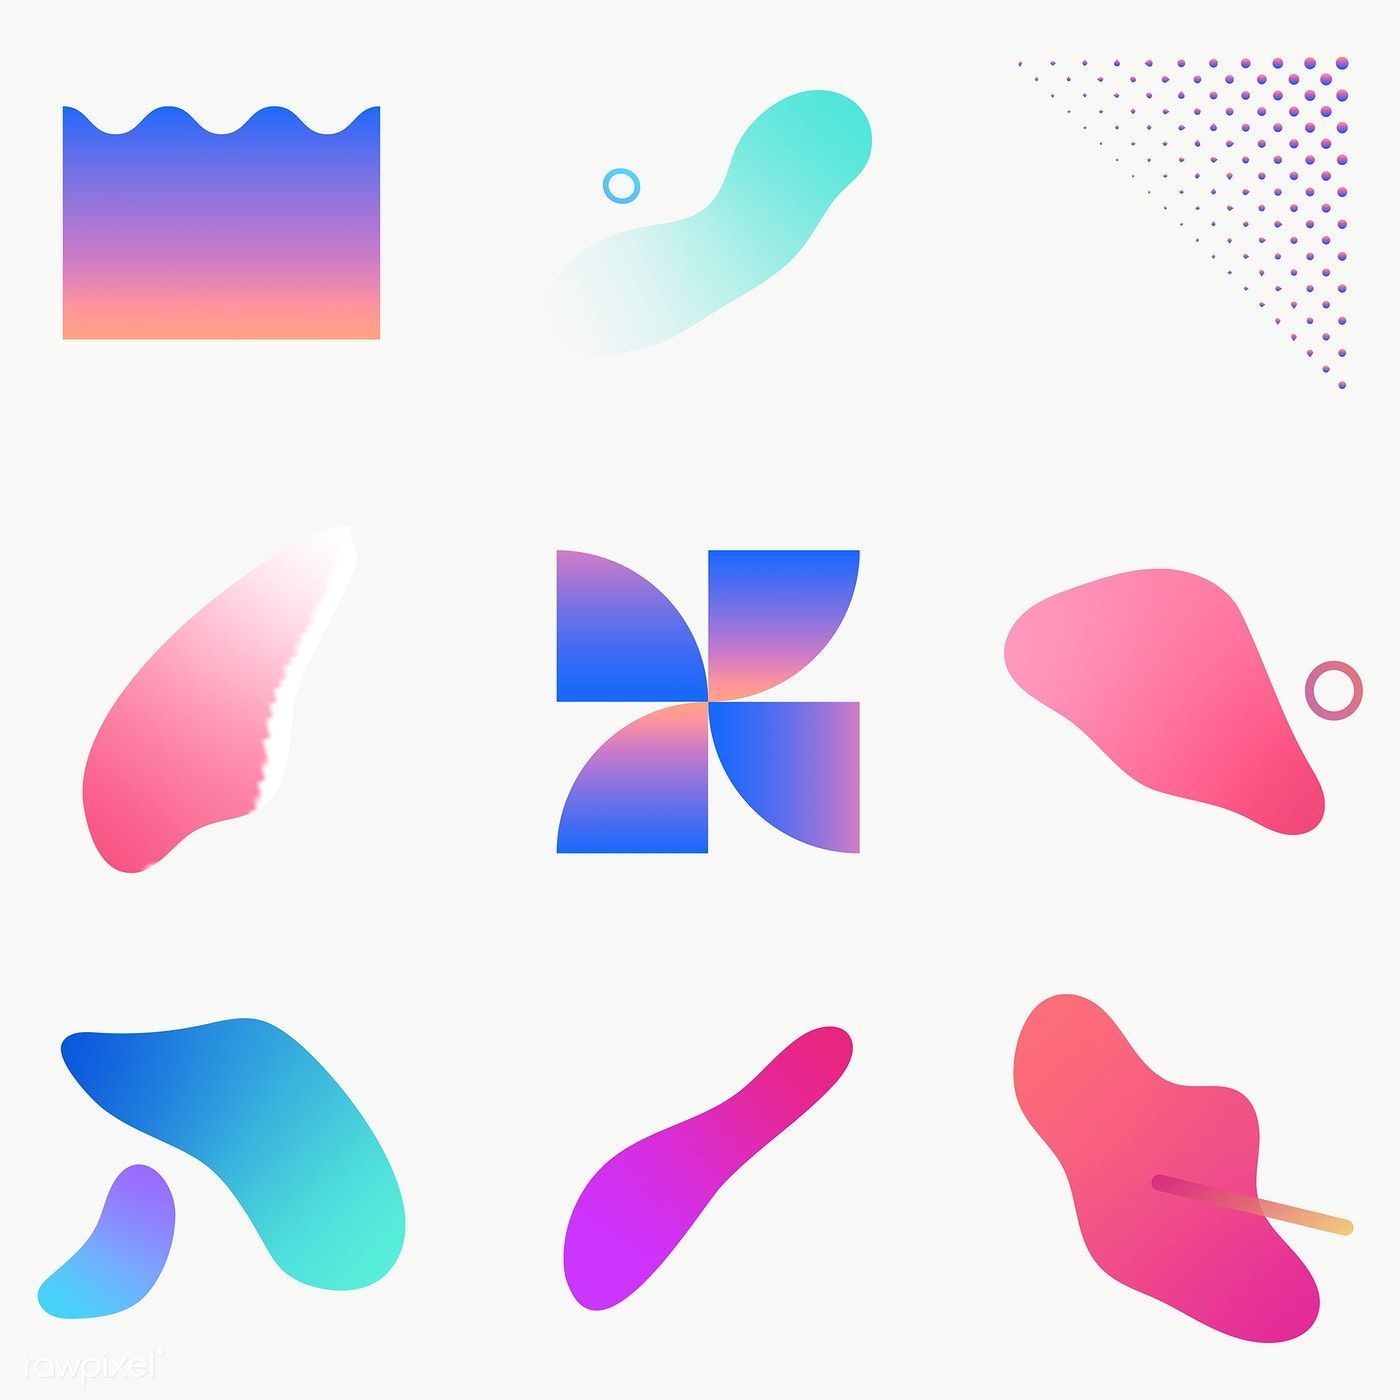 Colorful Gradient Elements Collection Transparent Png Premium Image By Rawpixel Com Nunny Gradient Illustrator Gradient Design Elements